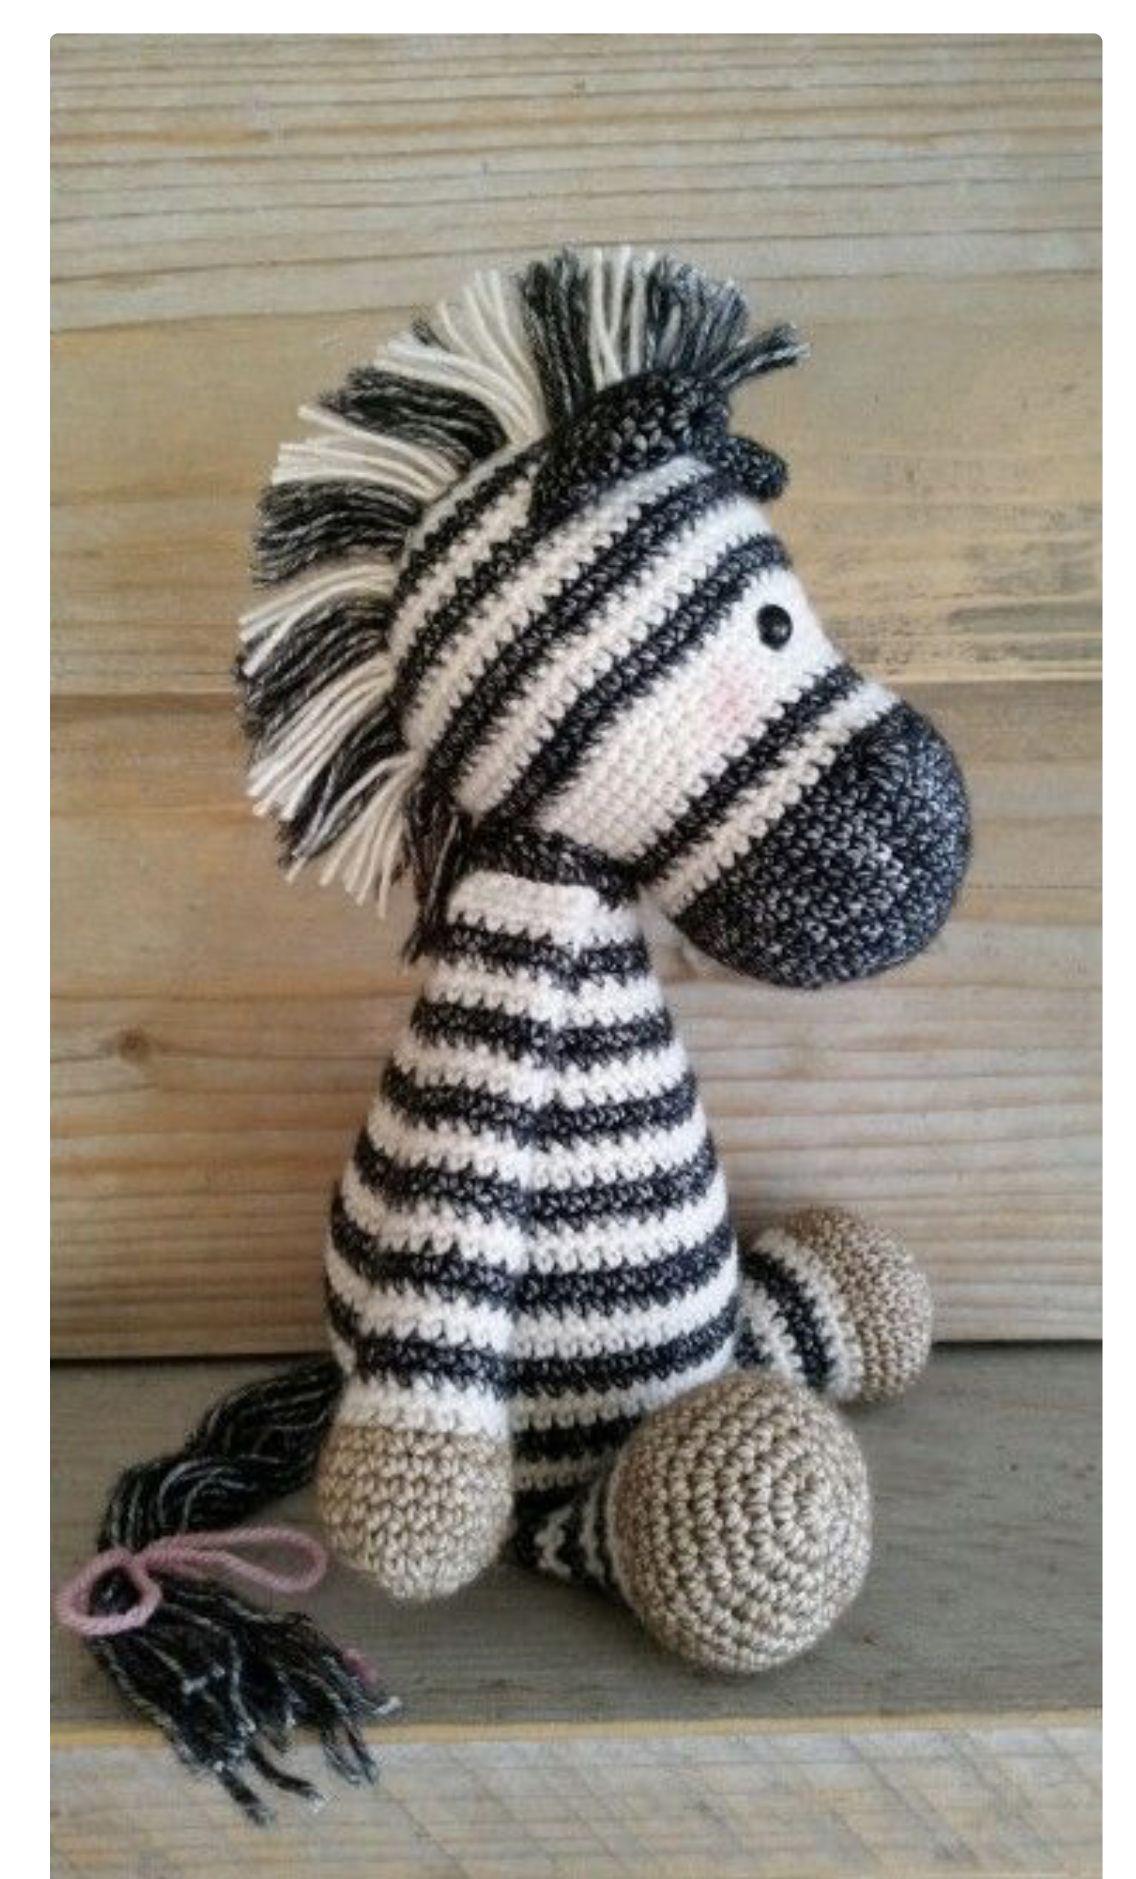 Zebra em Amigurumi no Elo7 | TZ Crochê (F16C9D) | 1879x1136